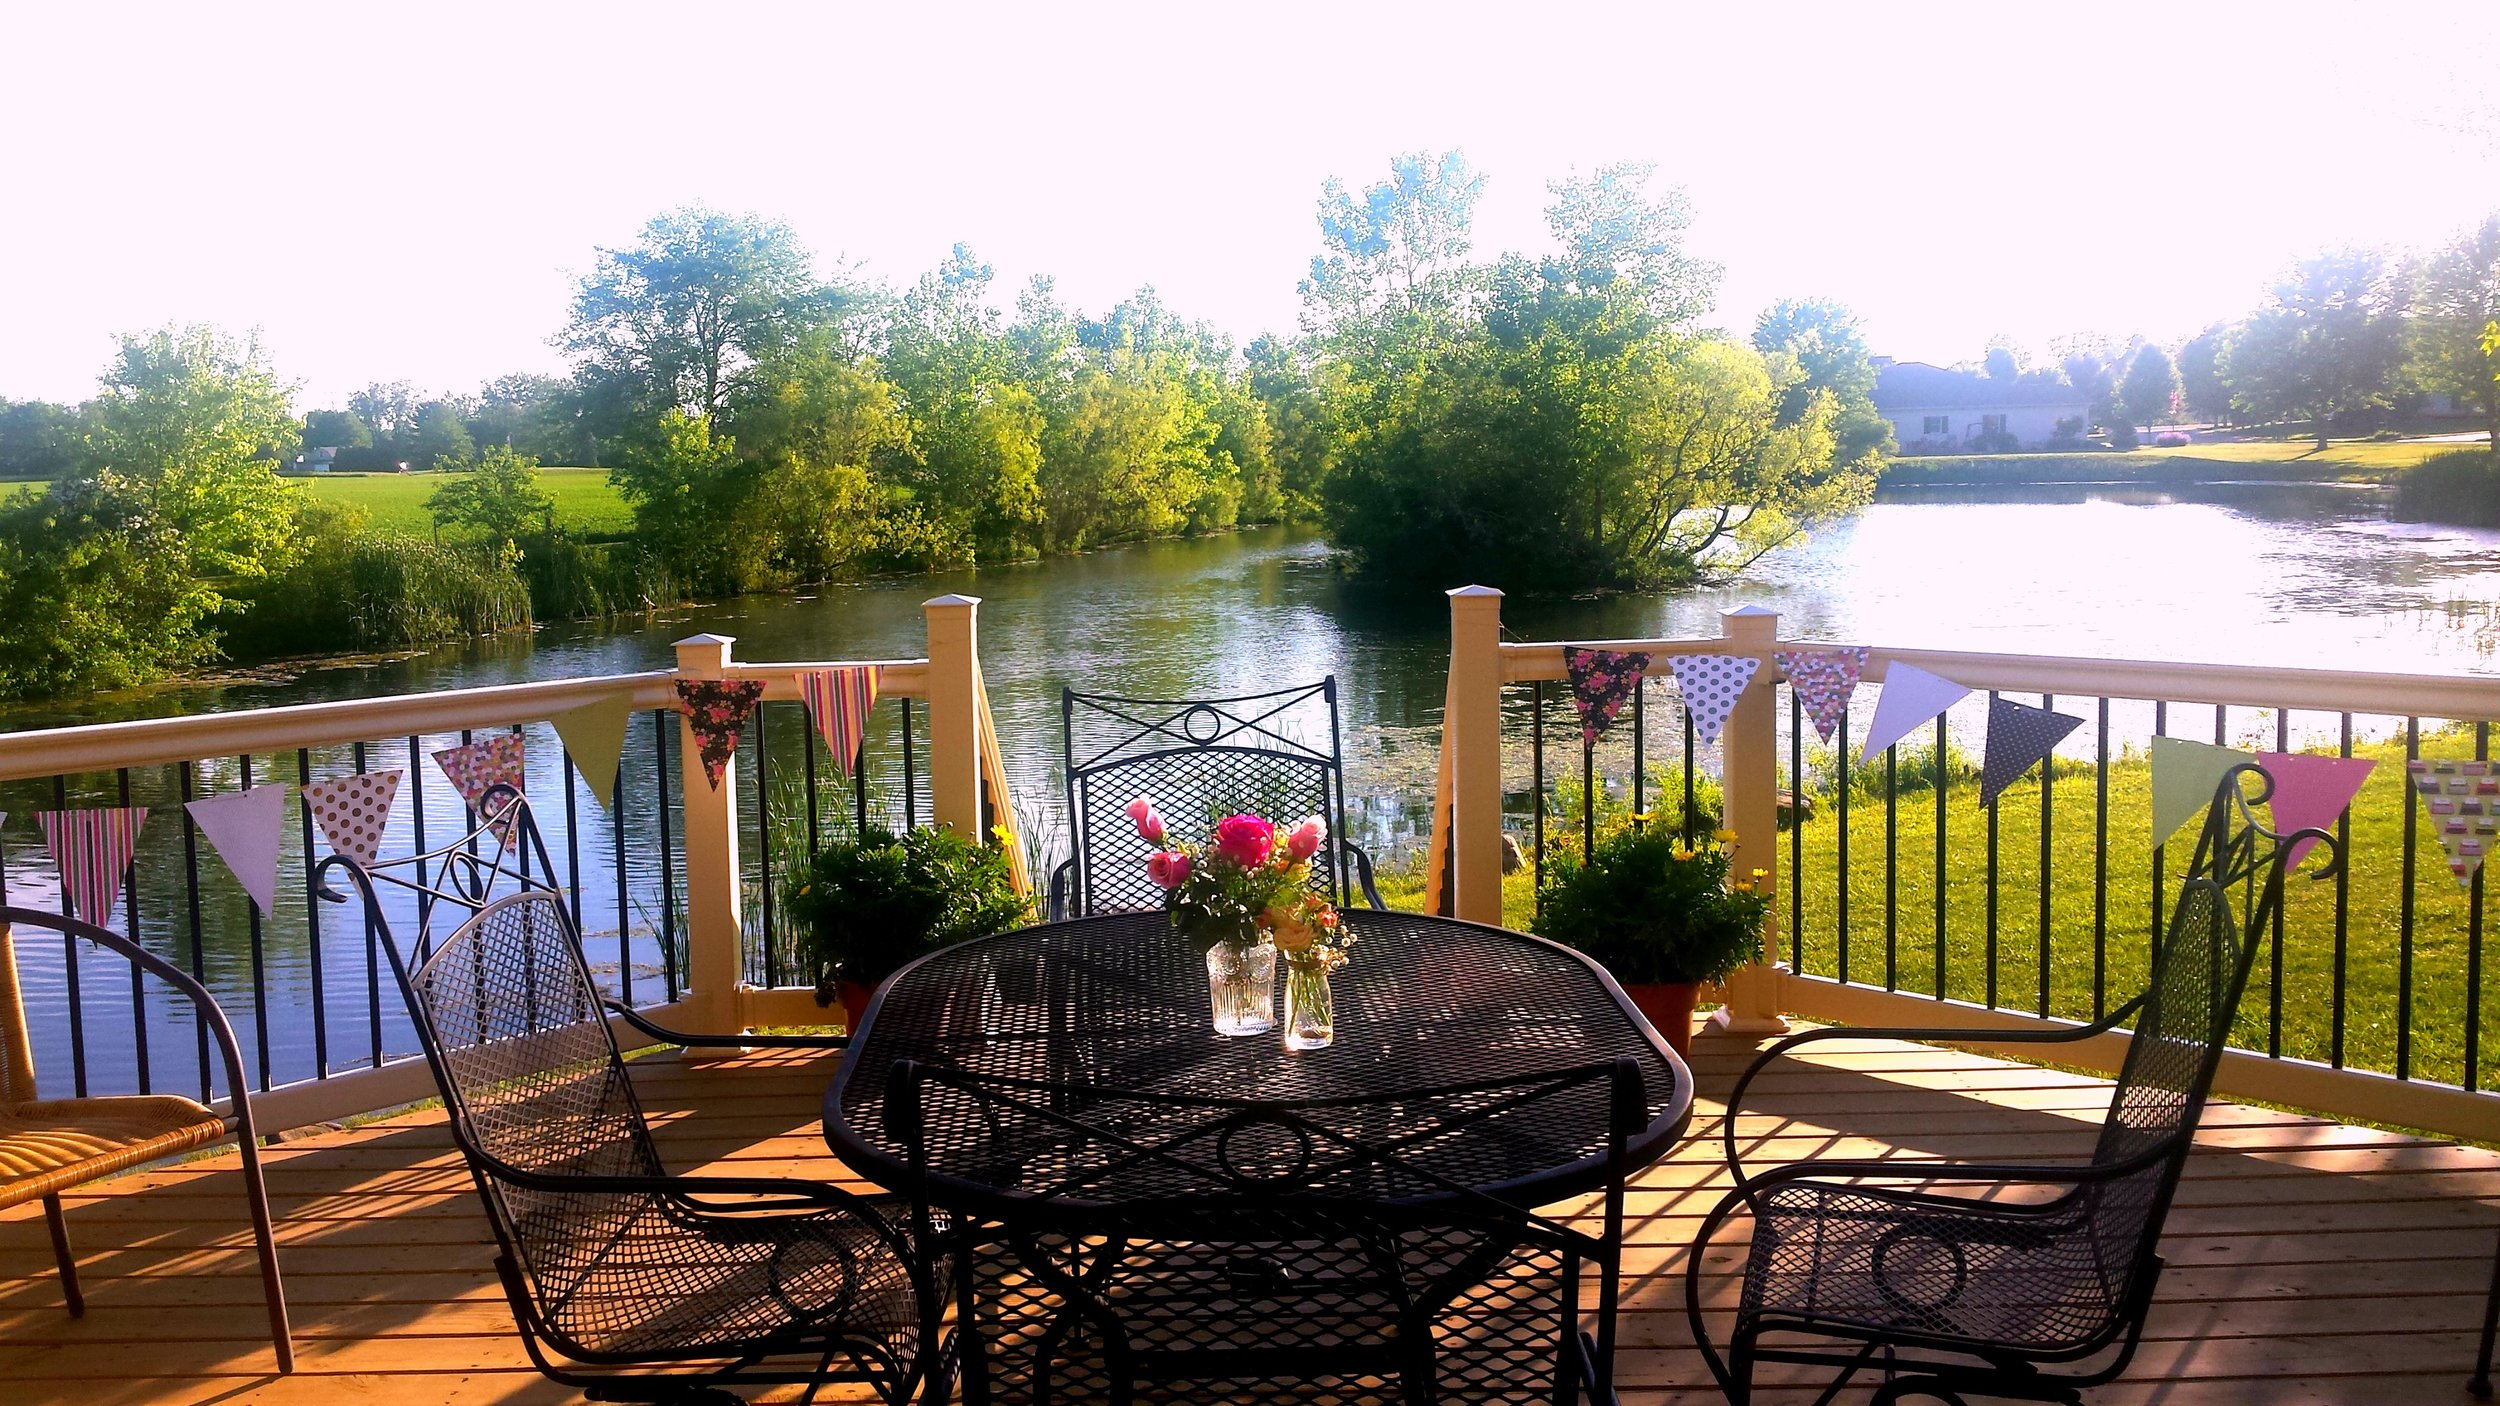 A beautiful summer day at Raven Lake!